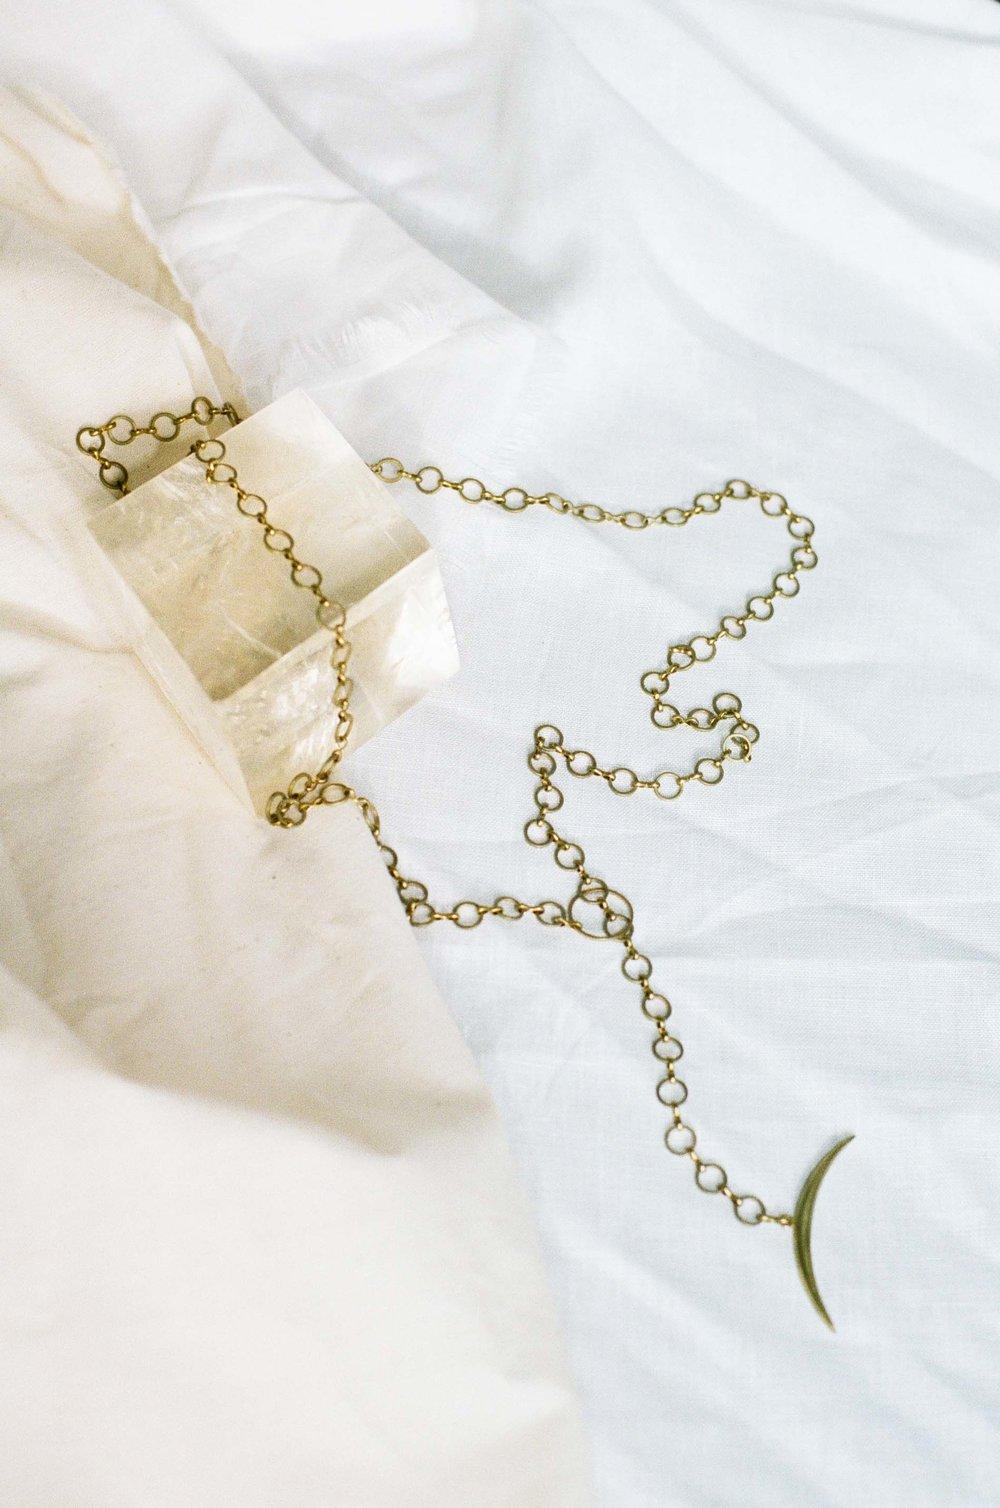 Dolorous Jewelry SS18 Lookbook 1 Brass Necklace.jpg